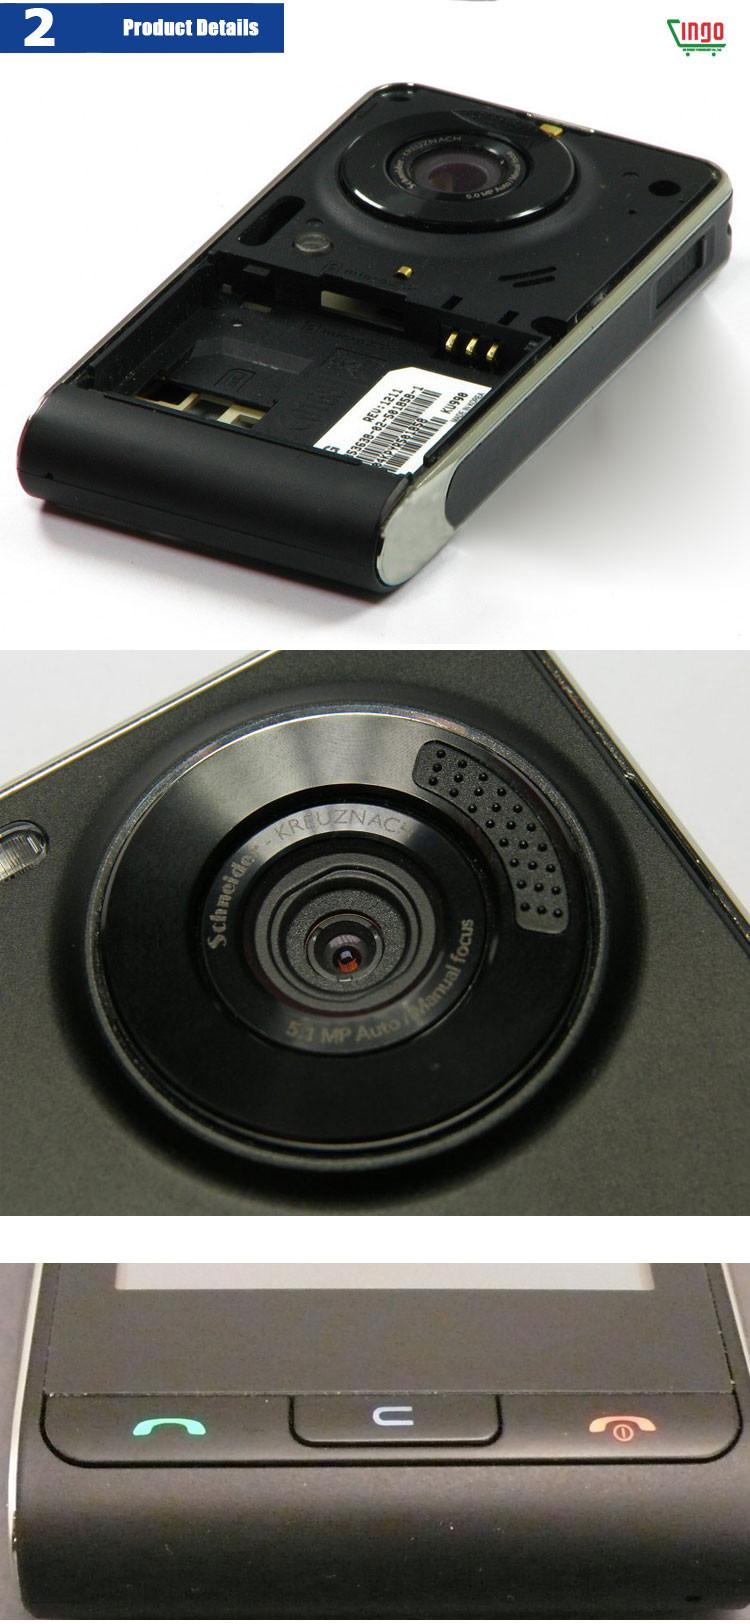 Мобильный телефон ku990 LG ku990 viewty, Bluetooth, 5 , 3.0'